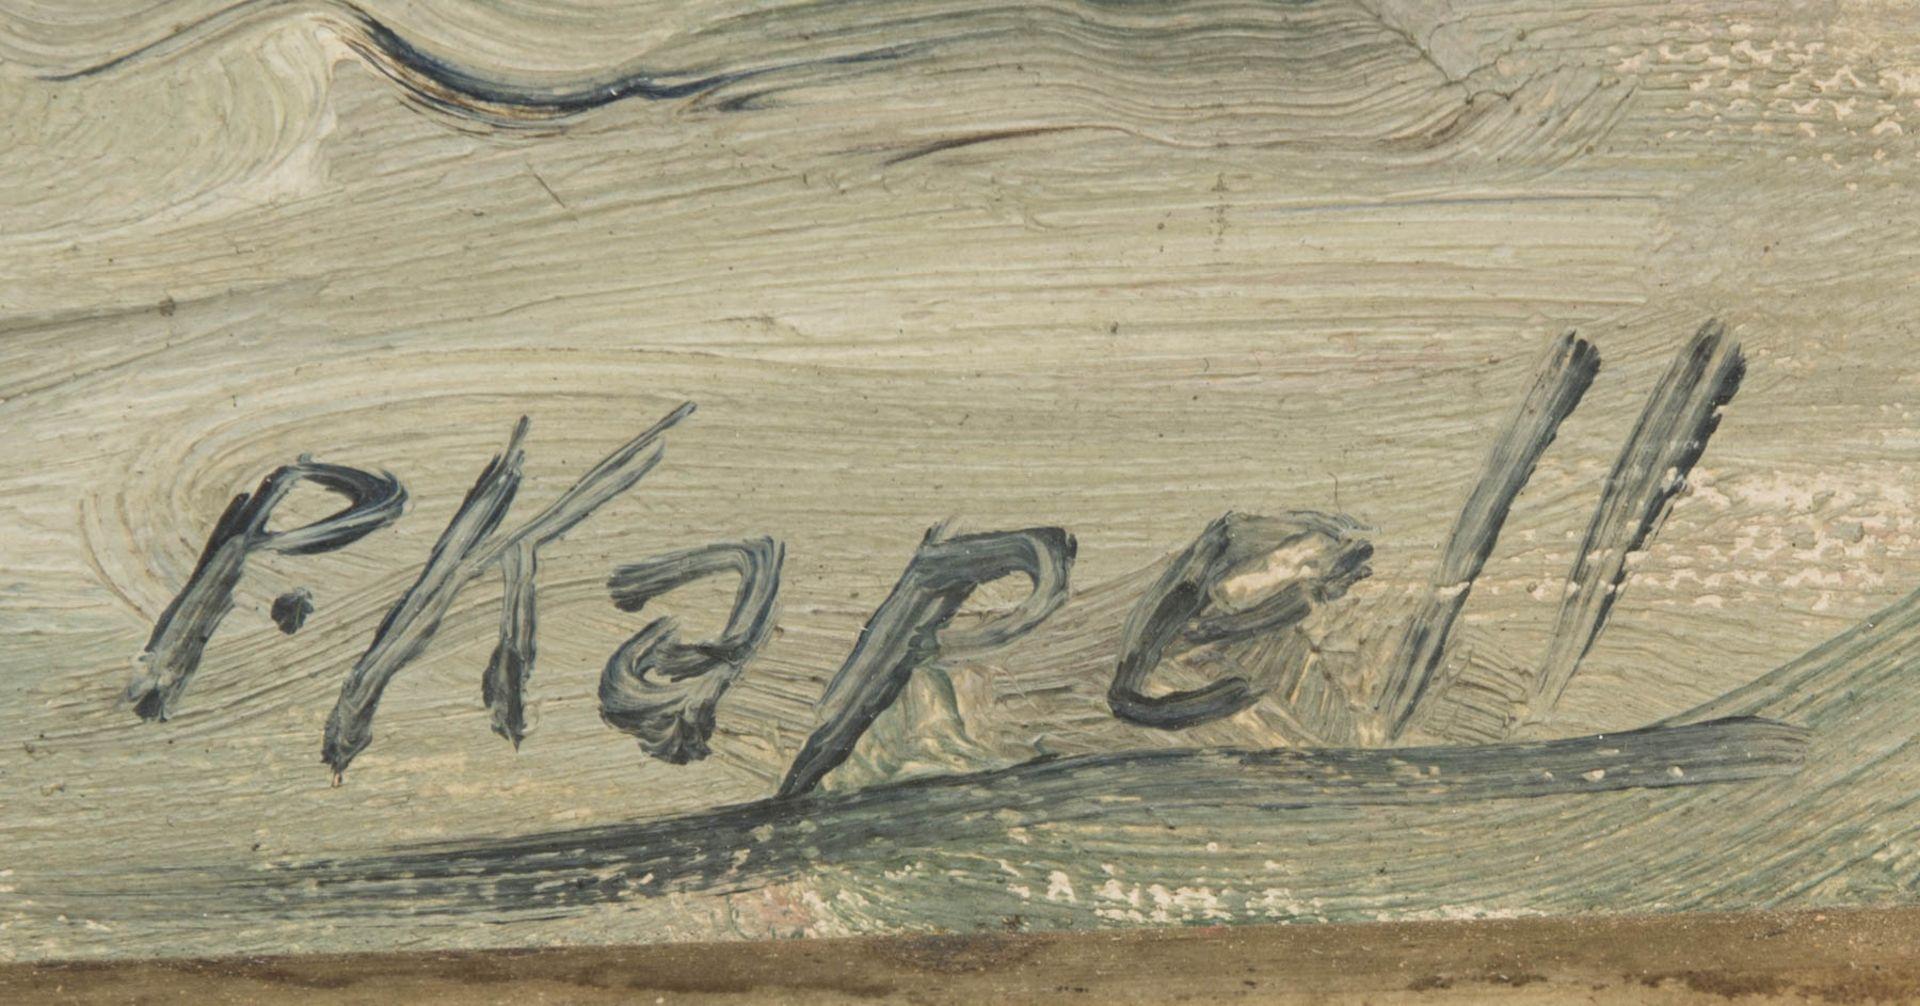 Paul Kapell, Segelboot, Öl auf Karton, 19./20. Jh.Landschaftsansicht, Segelboot im Wi - Bild 3 aus 6